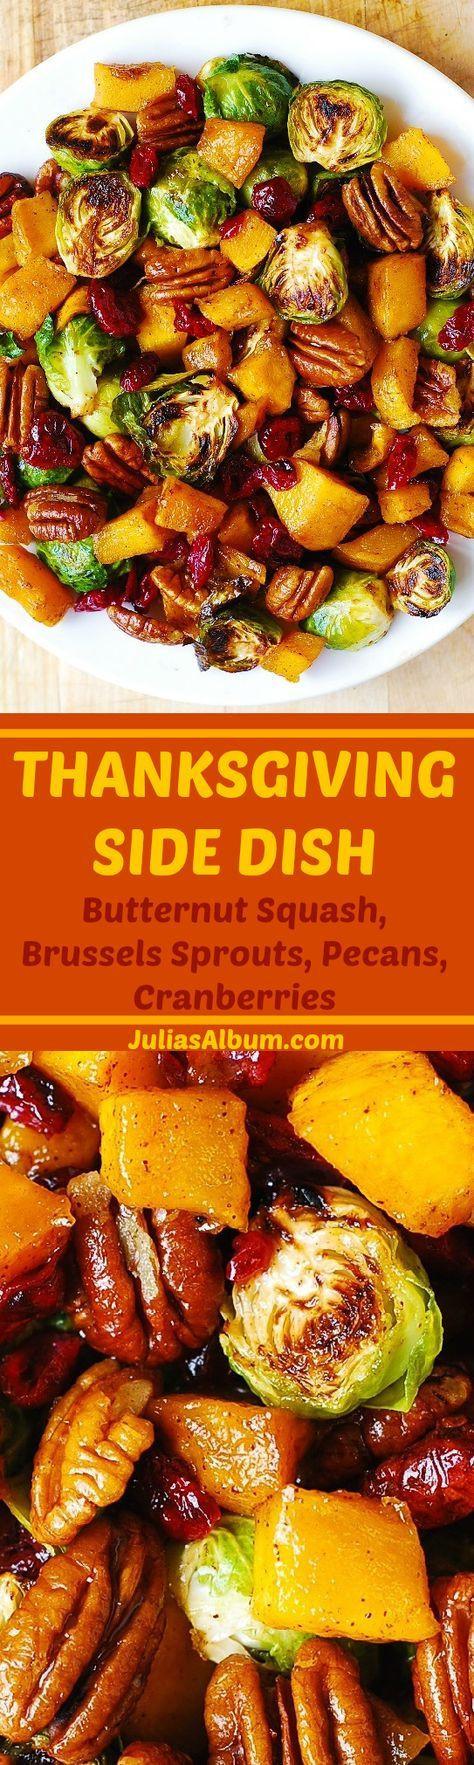 Vegan Thanksgiving Side Dishes  Best 25 Thanksgiving recipes ideas on Pinterest